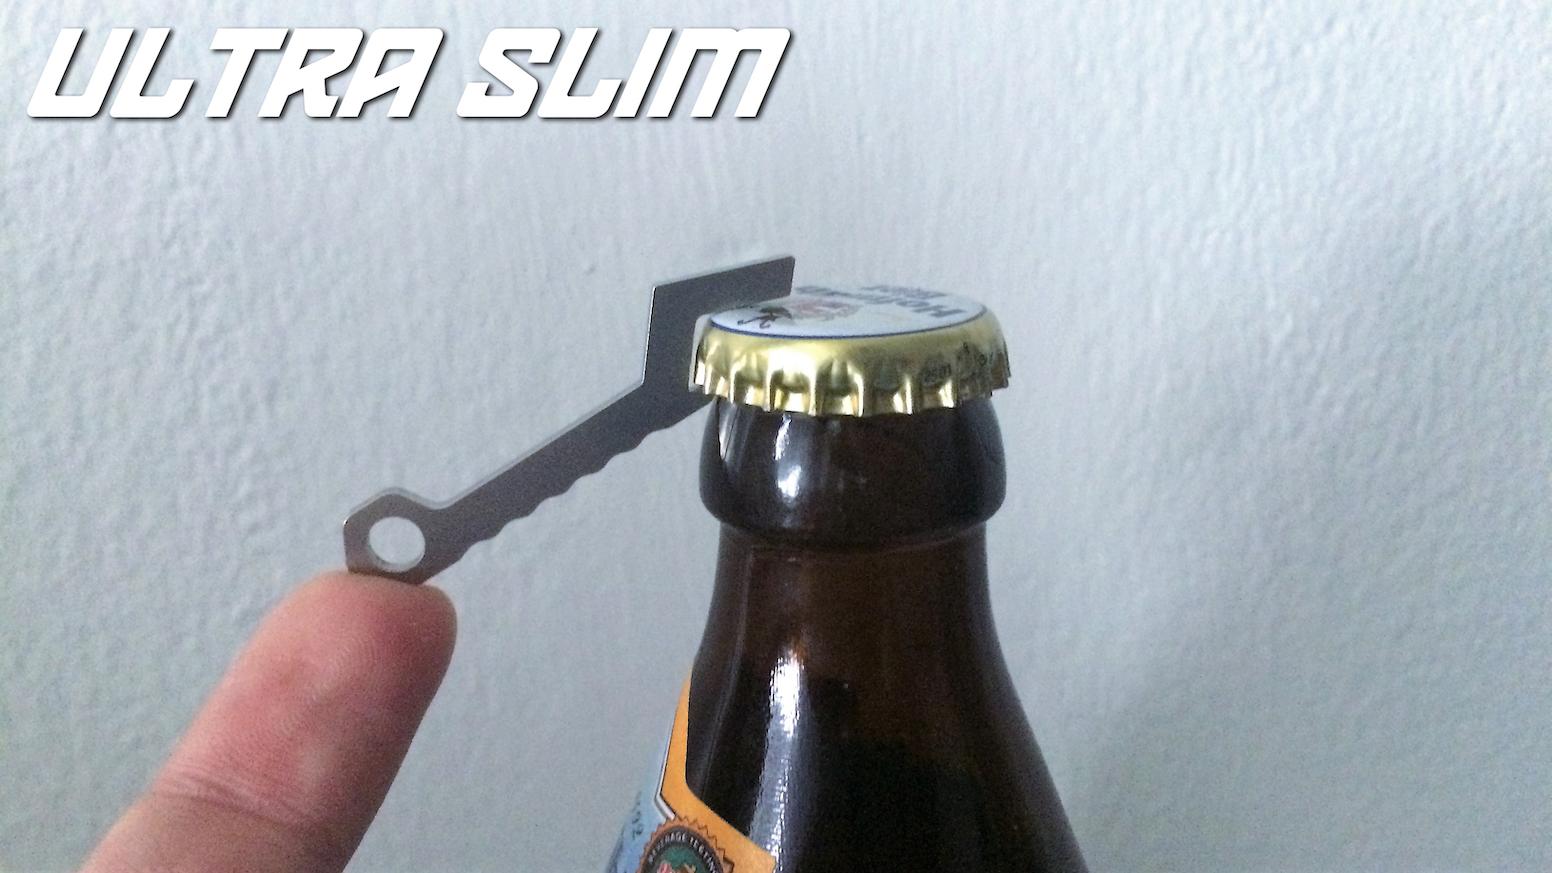 ultra slim bottle opener stainless steel by niklas w kickstarter. Black Bedroom Furniture Sets. Home Design Ideas